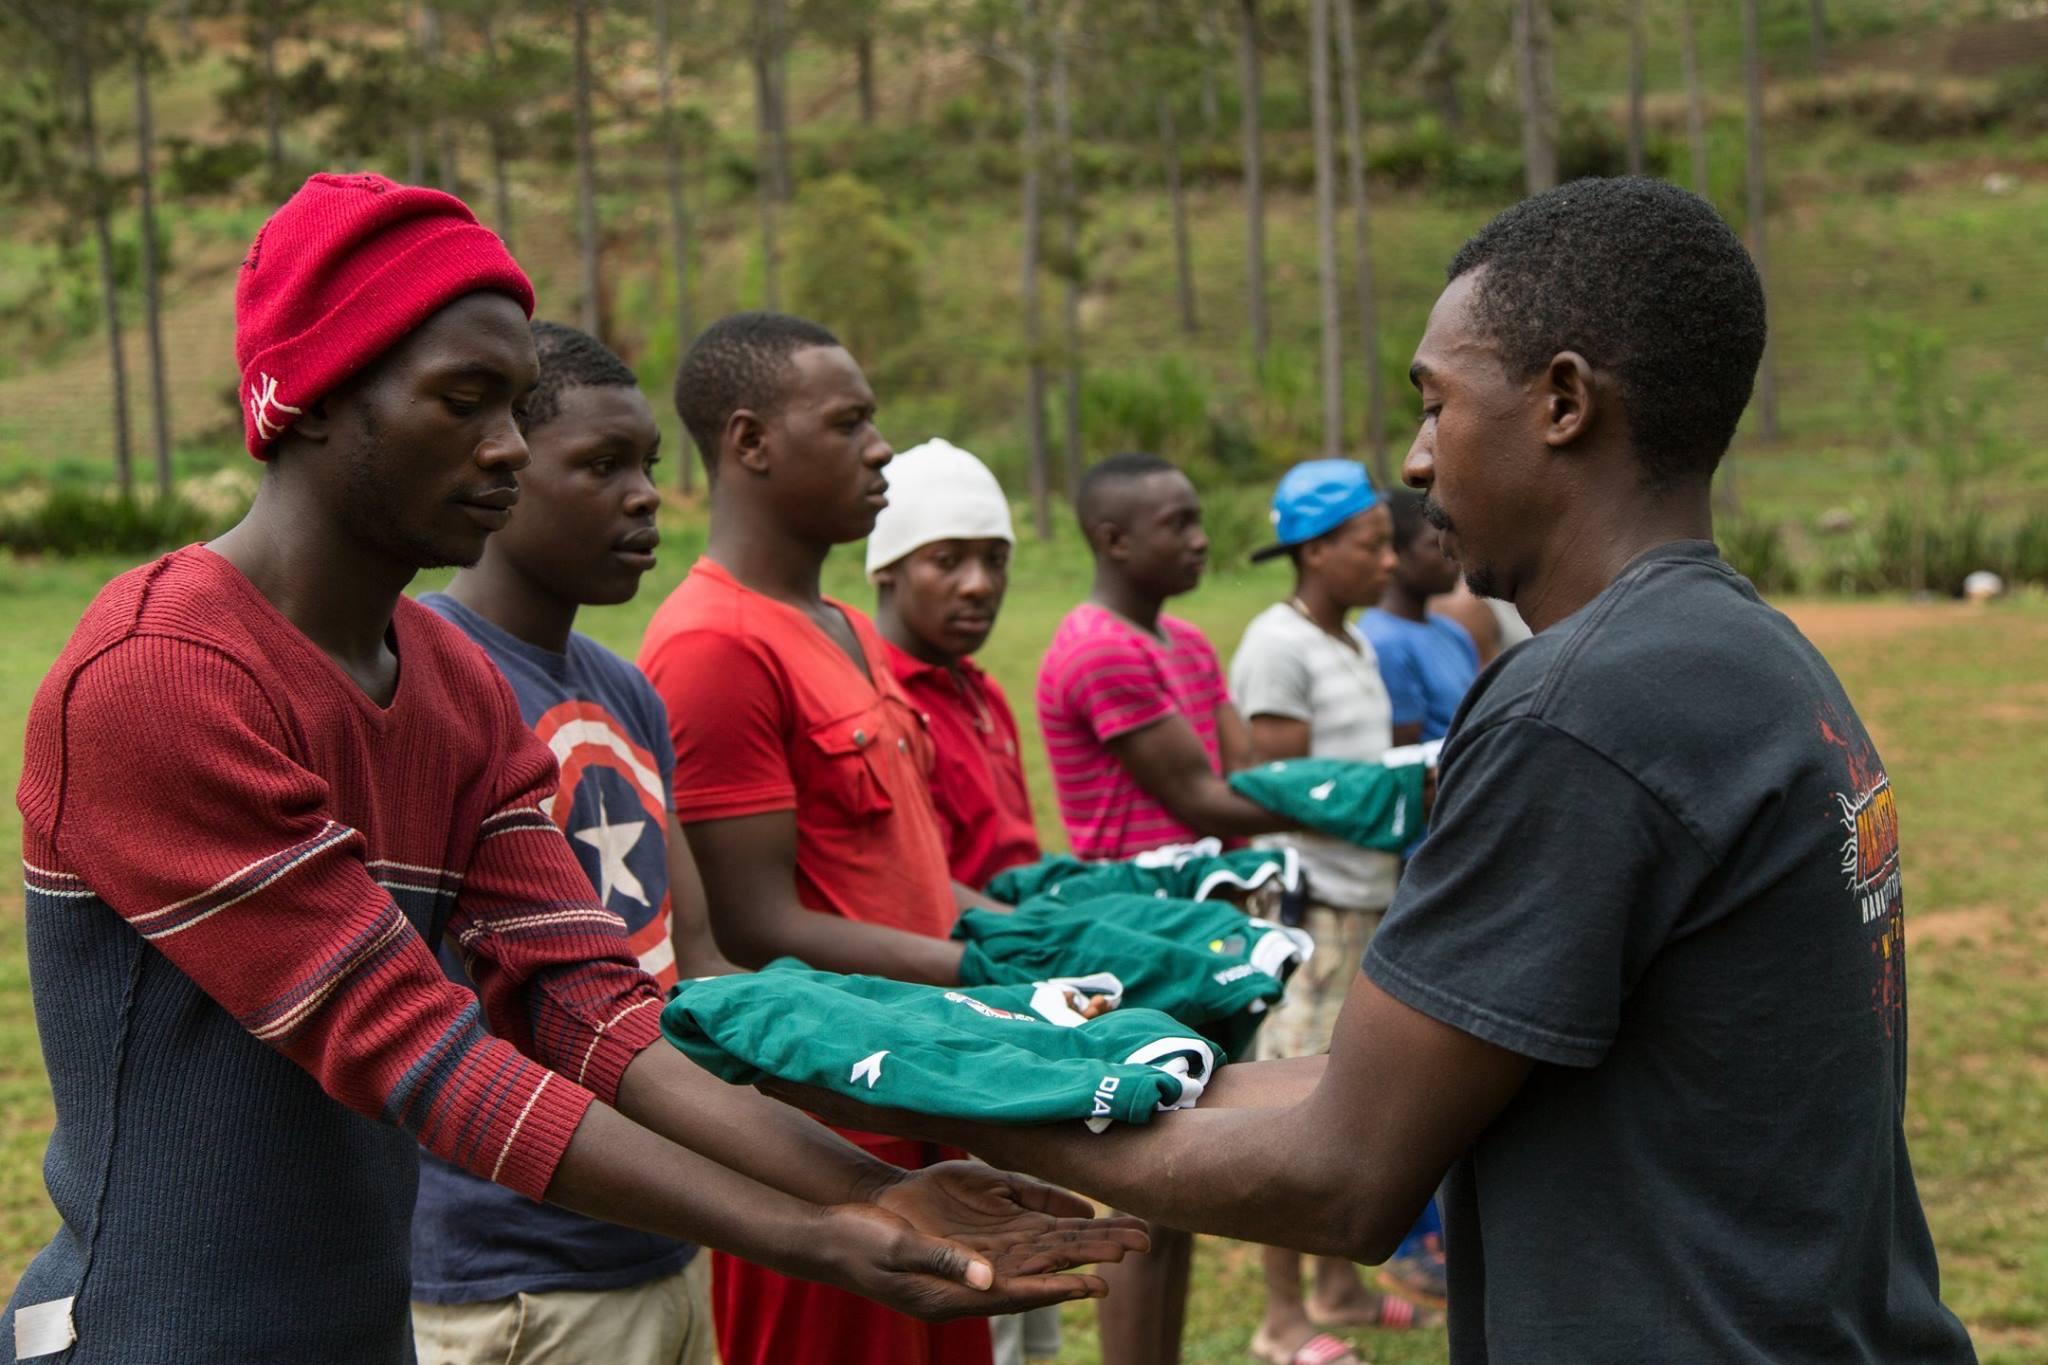 Haitian men being given soccer jerseys in Boukan Chat, Haiti